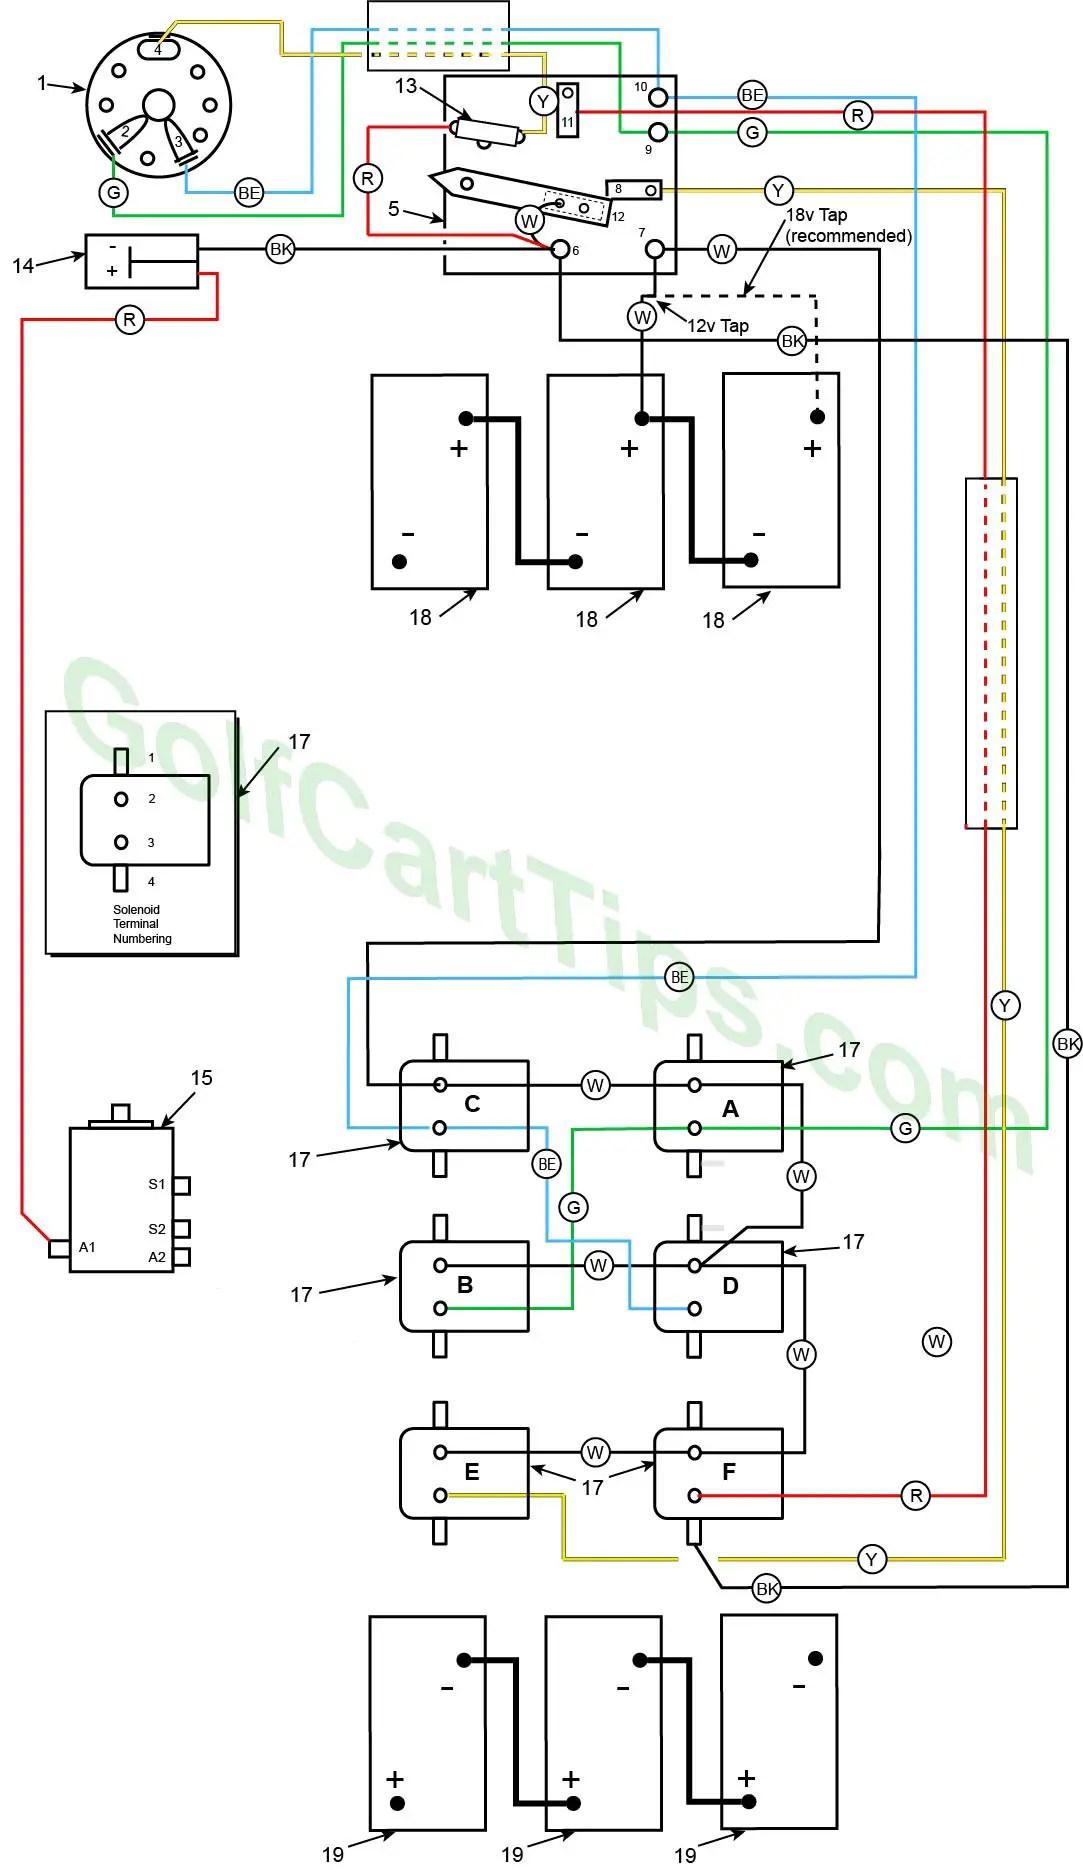 hight resolution of 1966 model de control circuit wiring diagram for 16 gauge wire harley davidson golf cart